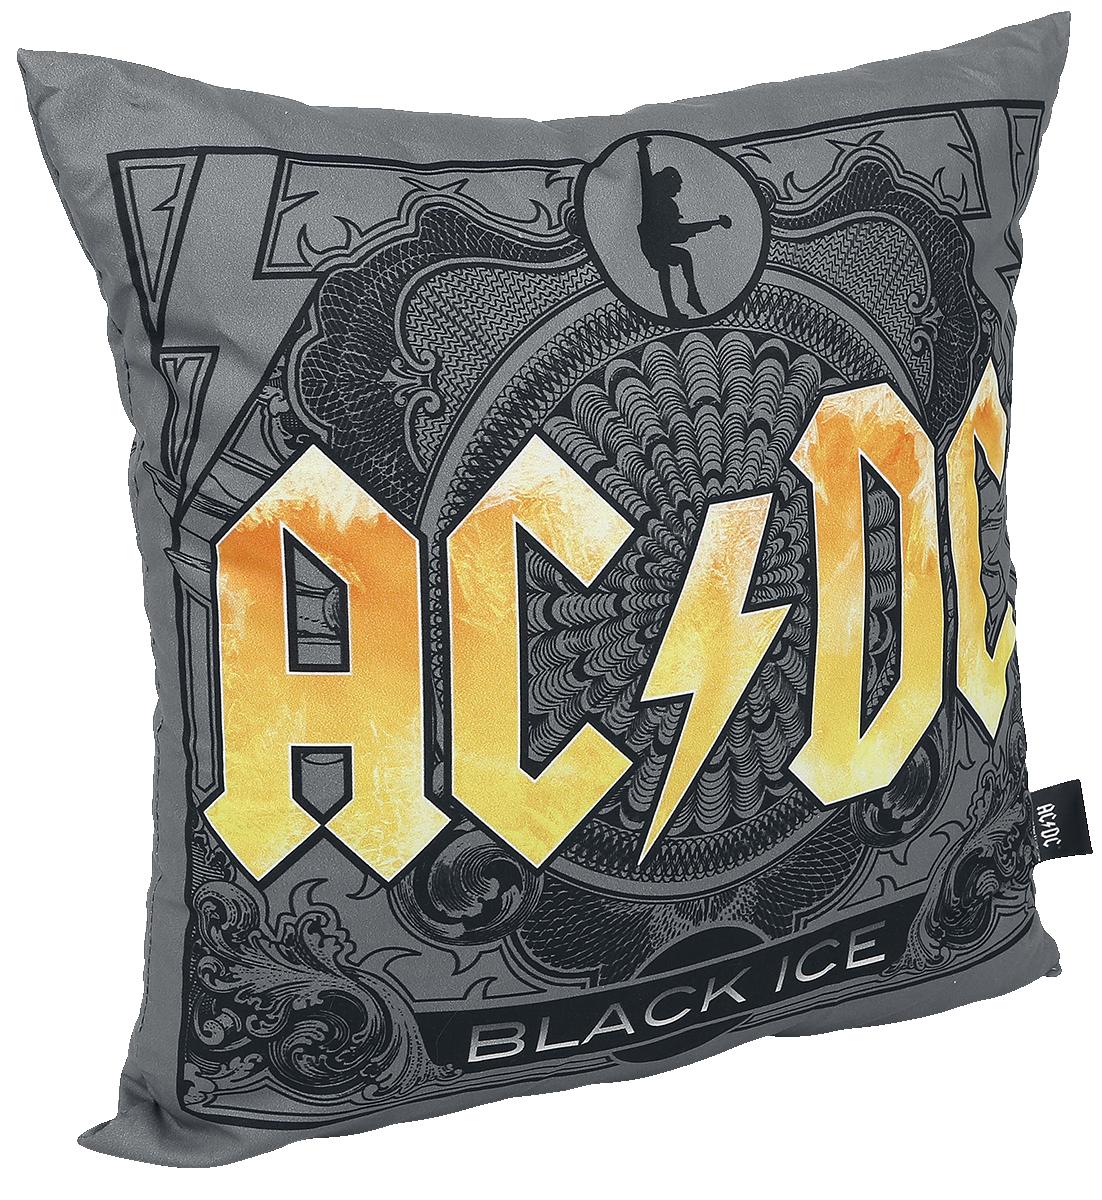 AC/DC - Black Ice - Kissen - grau| gelb